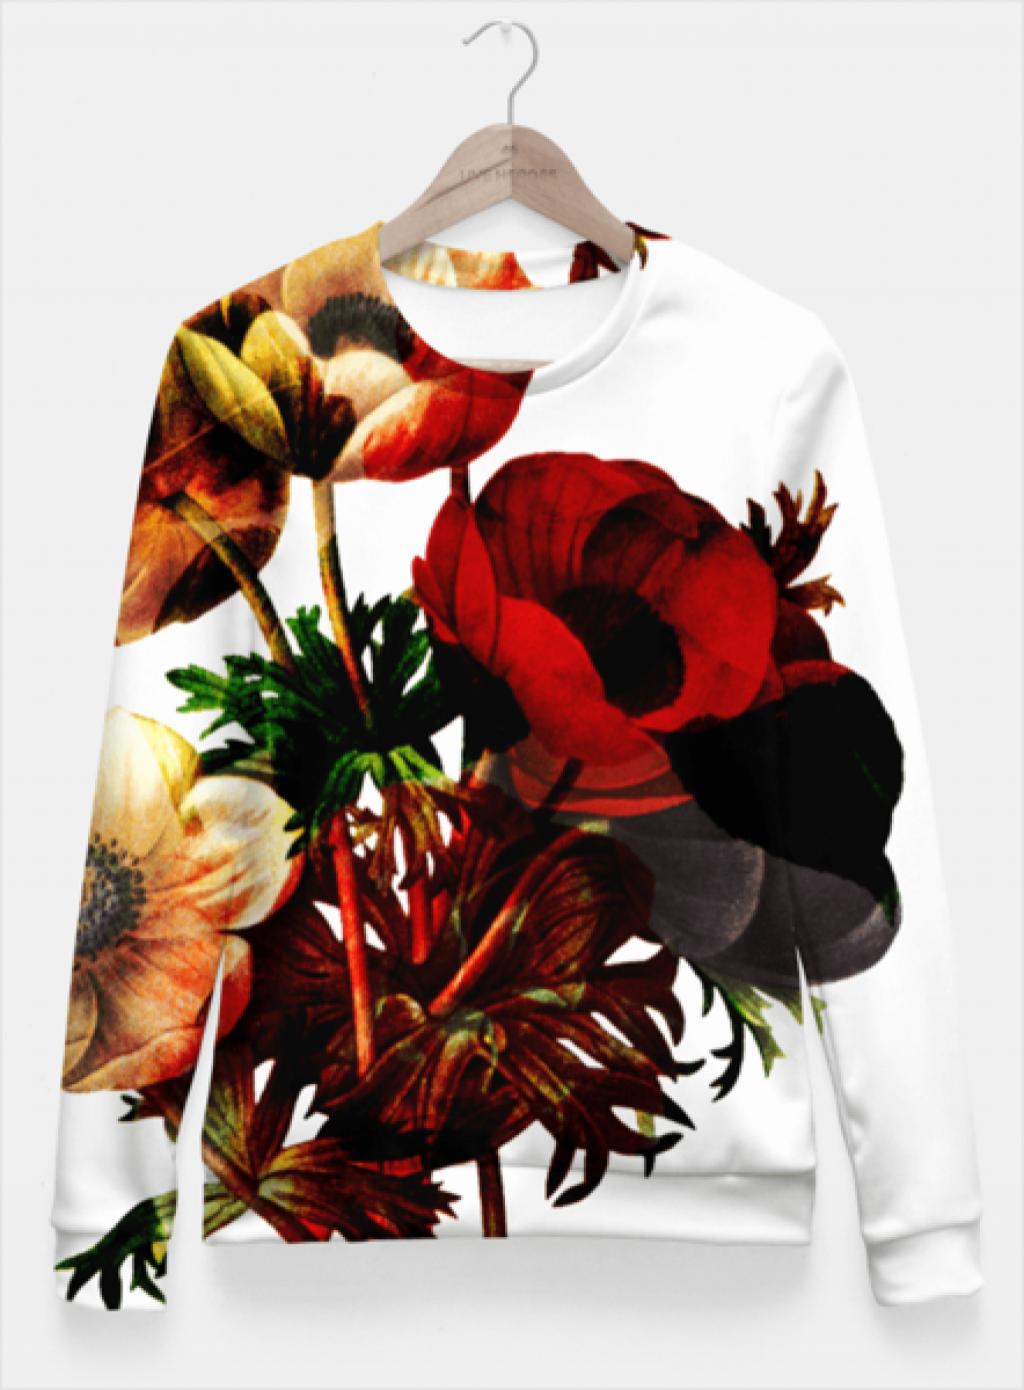 15424423030_sadaf-hamid-sweat-shirt-vintage-bunch-fitted-waist-sweater-women-1027417243688_grande.png